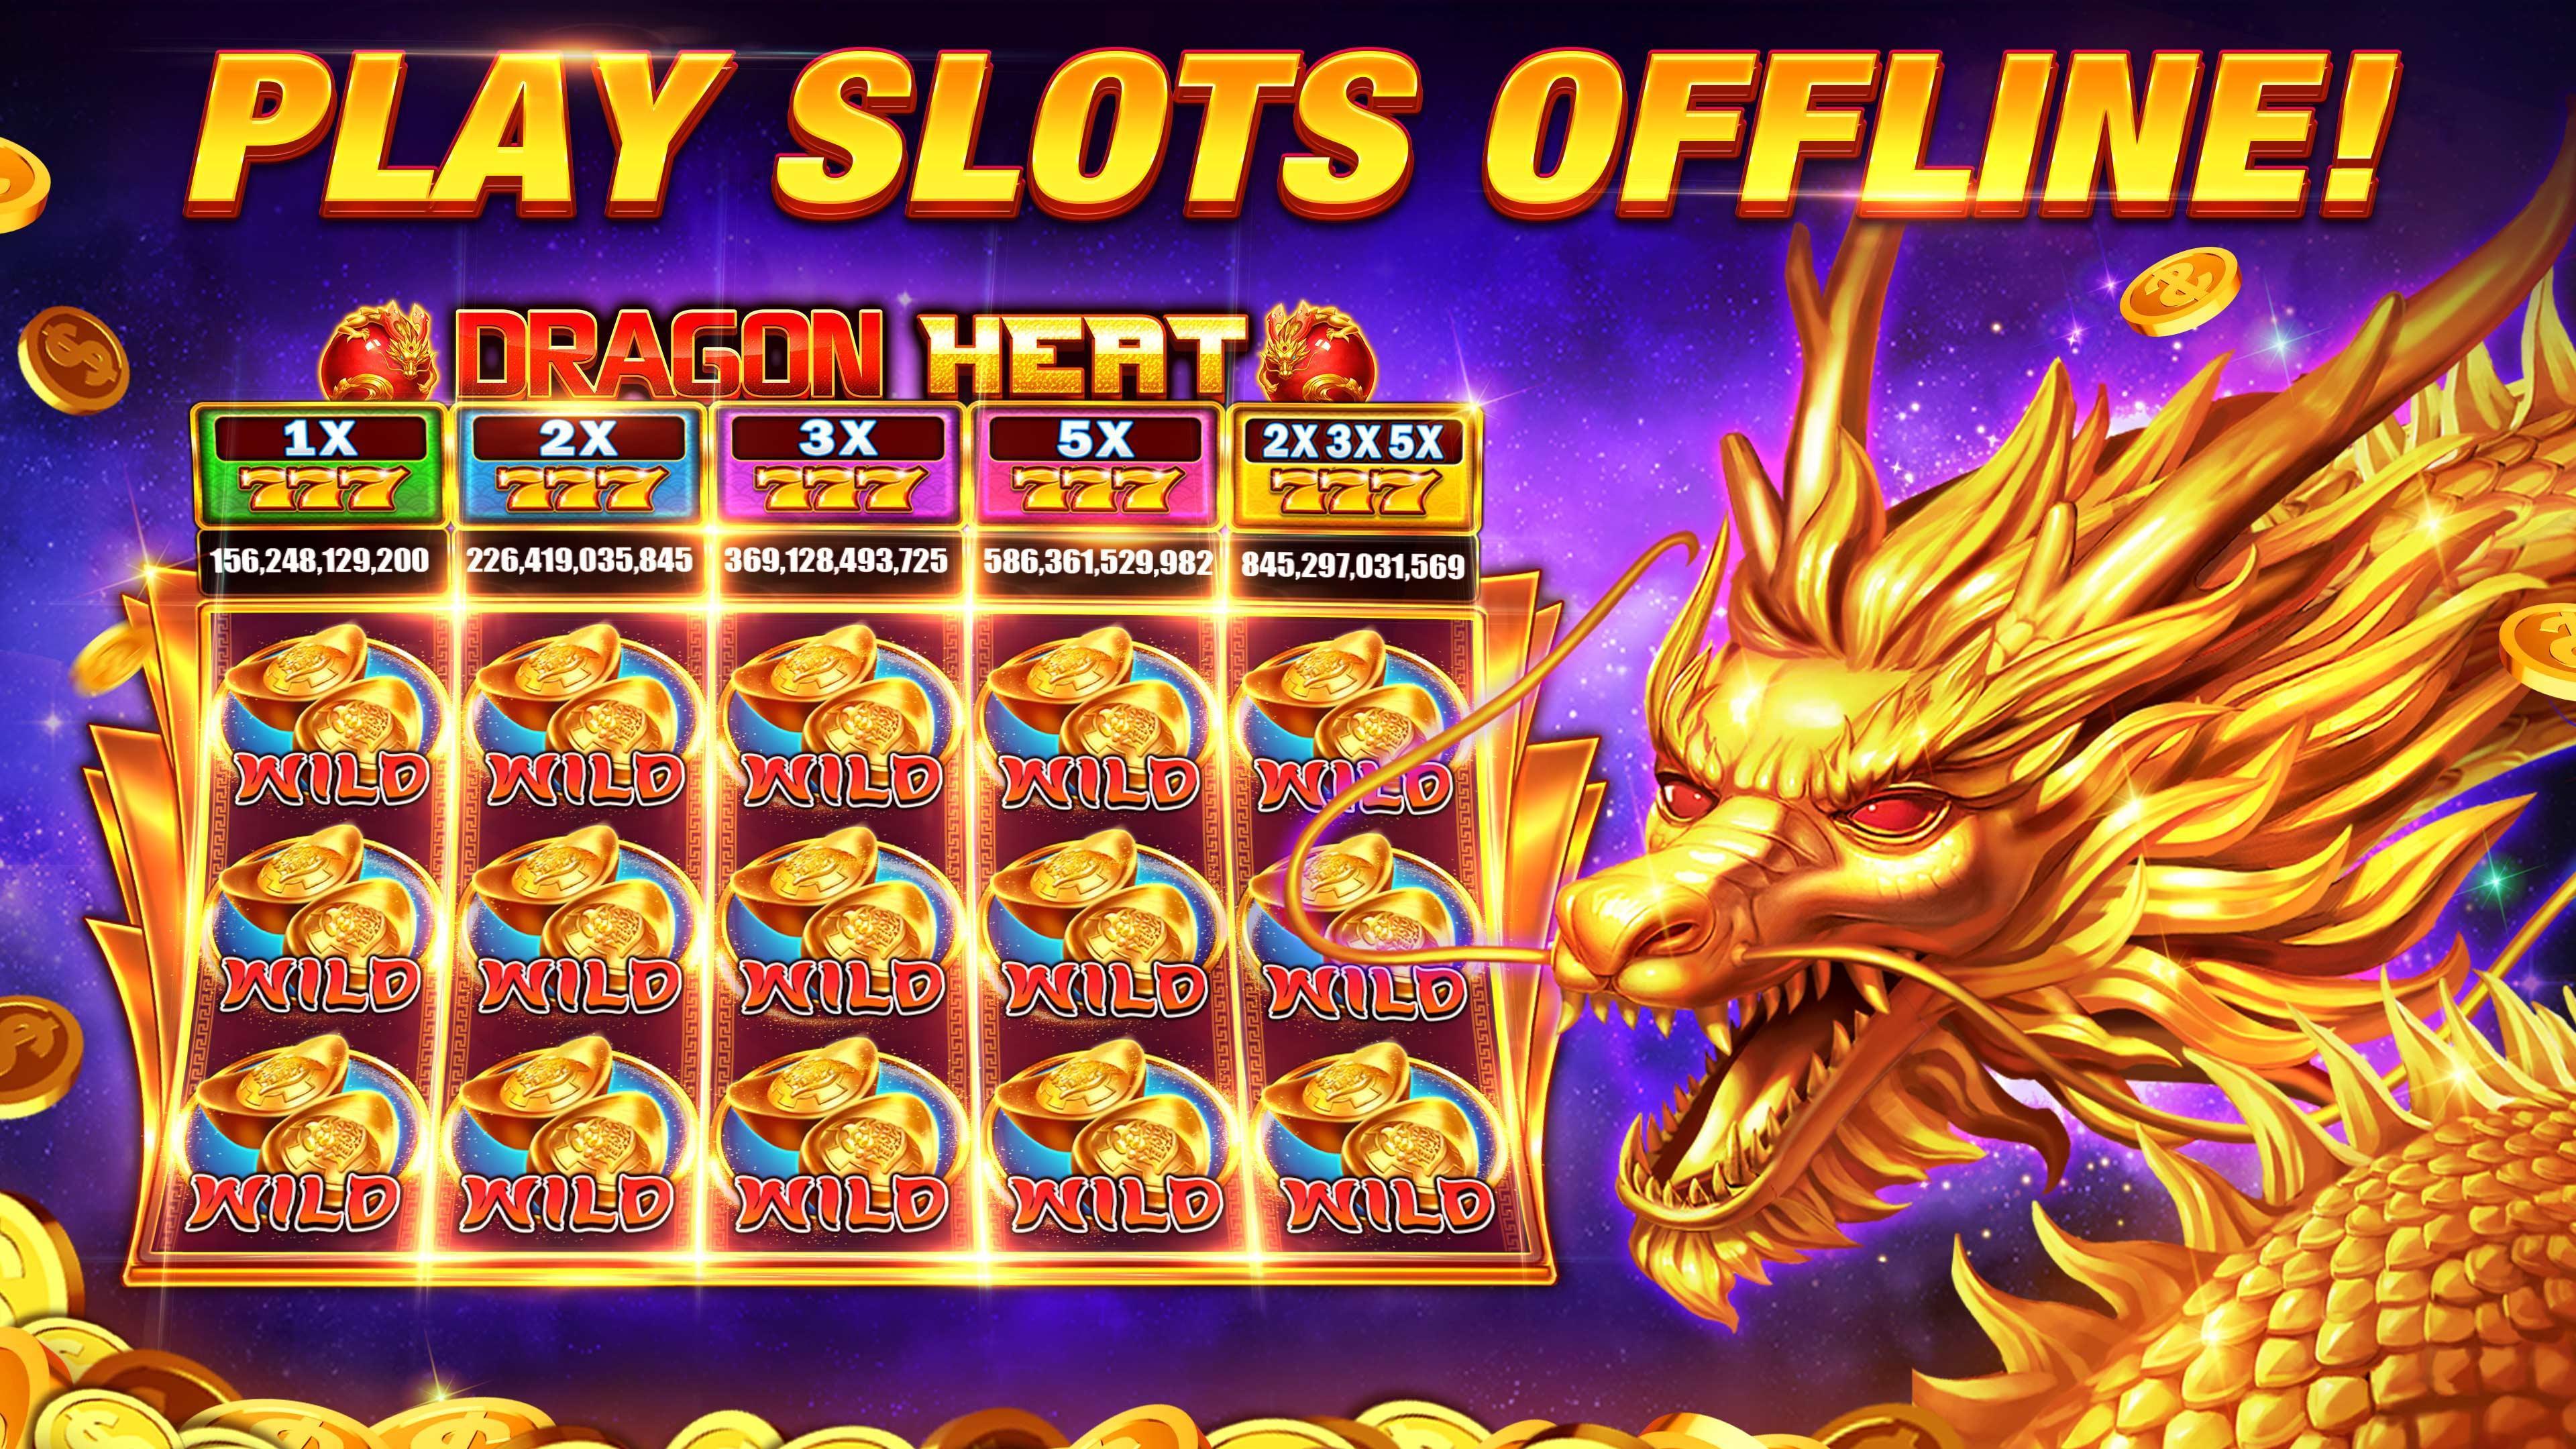 Slots Casino - Jackpot Mania 1.84.1 Screenshot 2